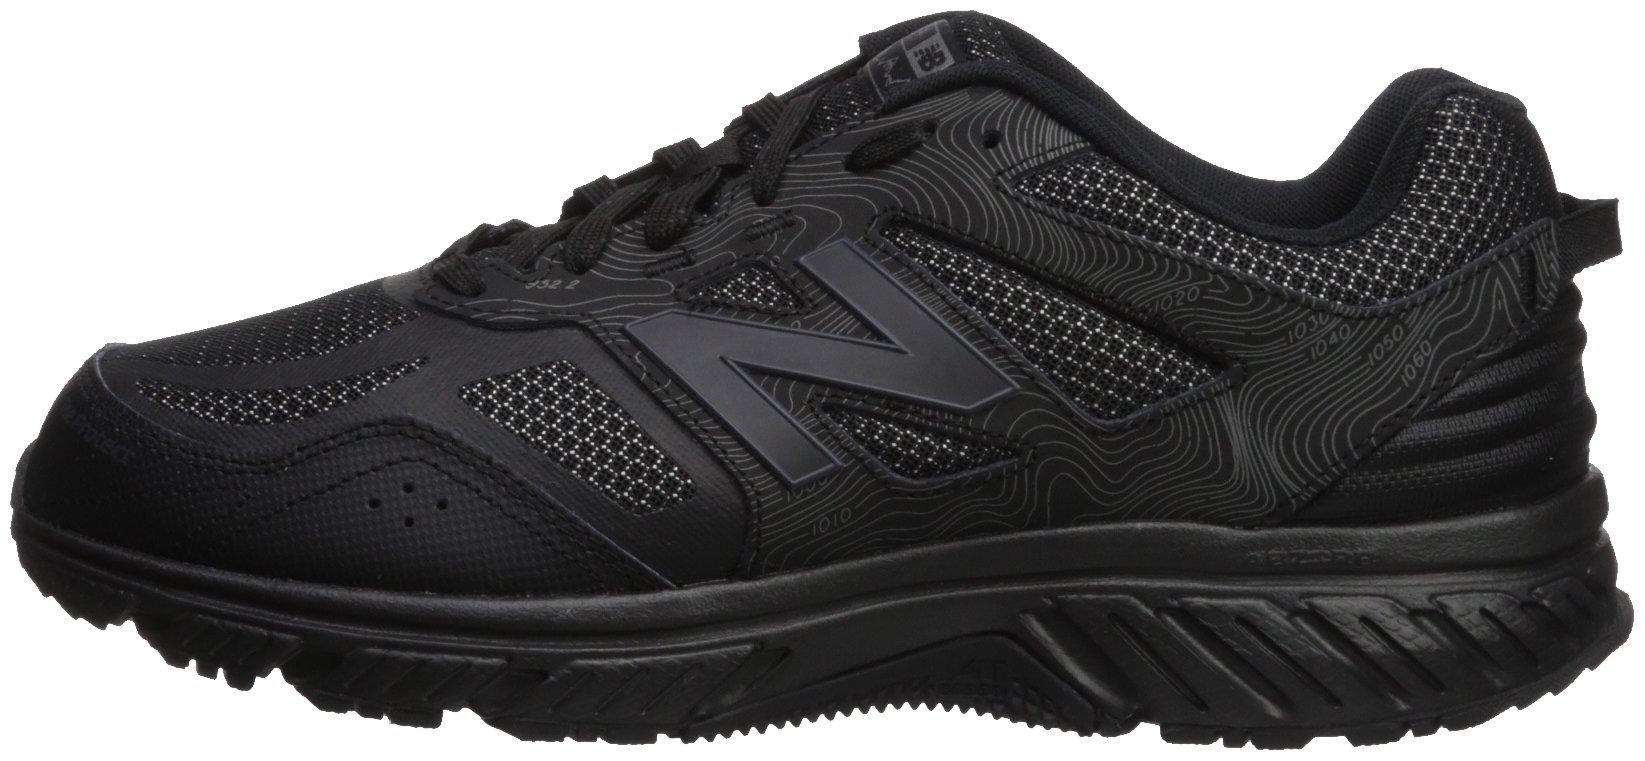 New Balance Men's 510v4 Cushioning Trail Running Shoe, Black, 7 D US by New Balance (Image #5)